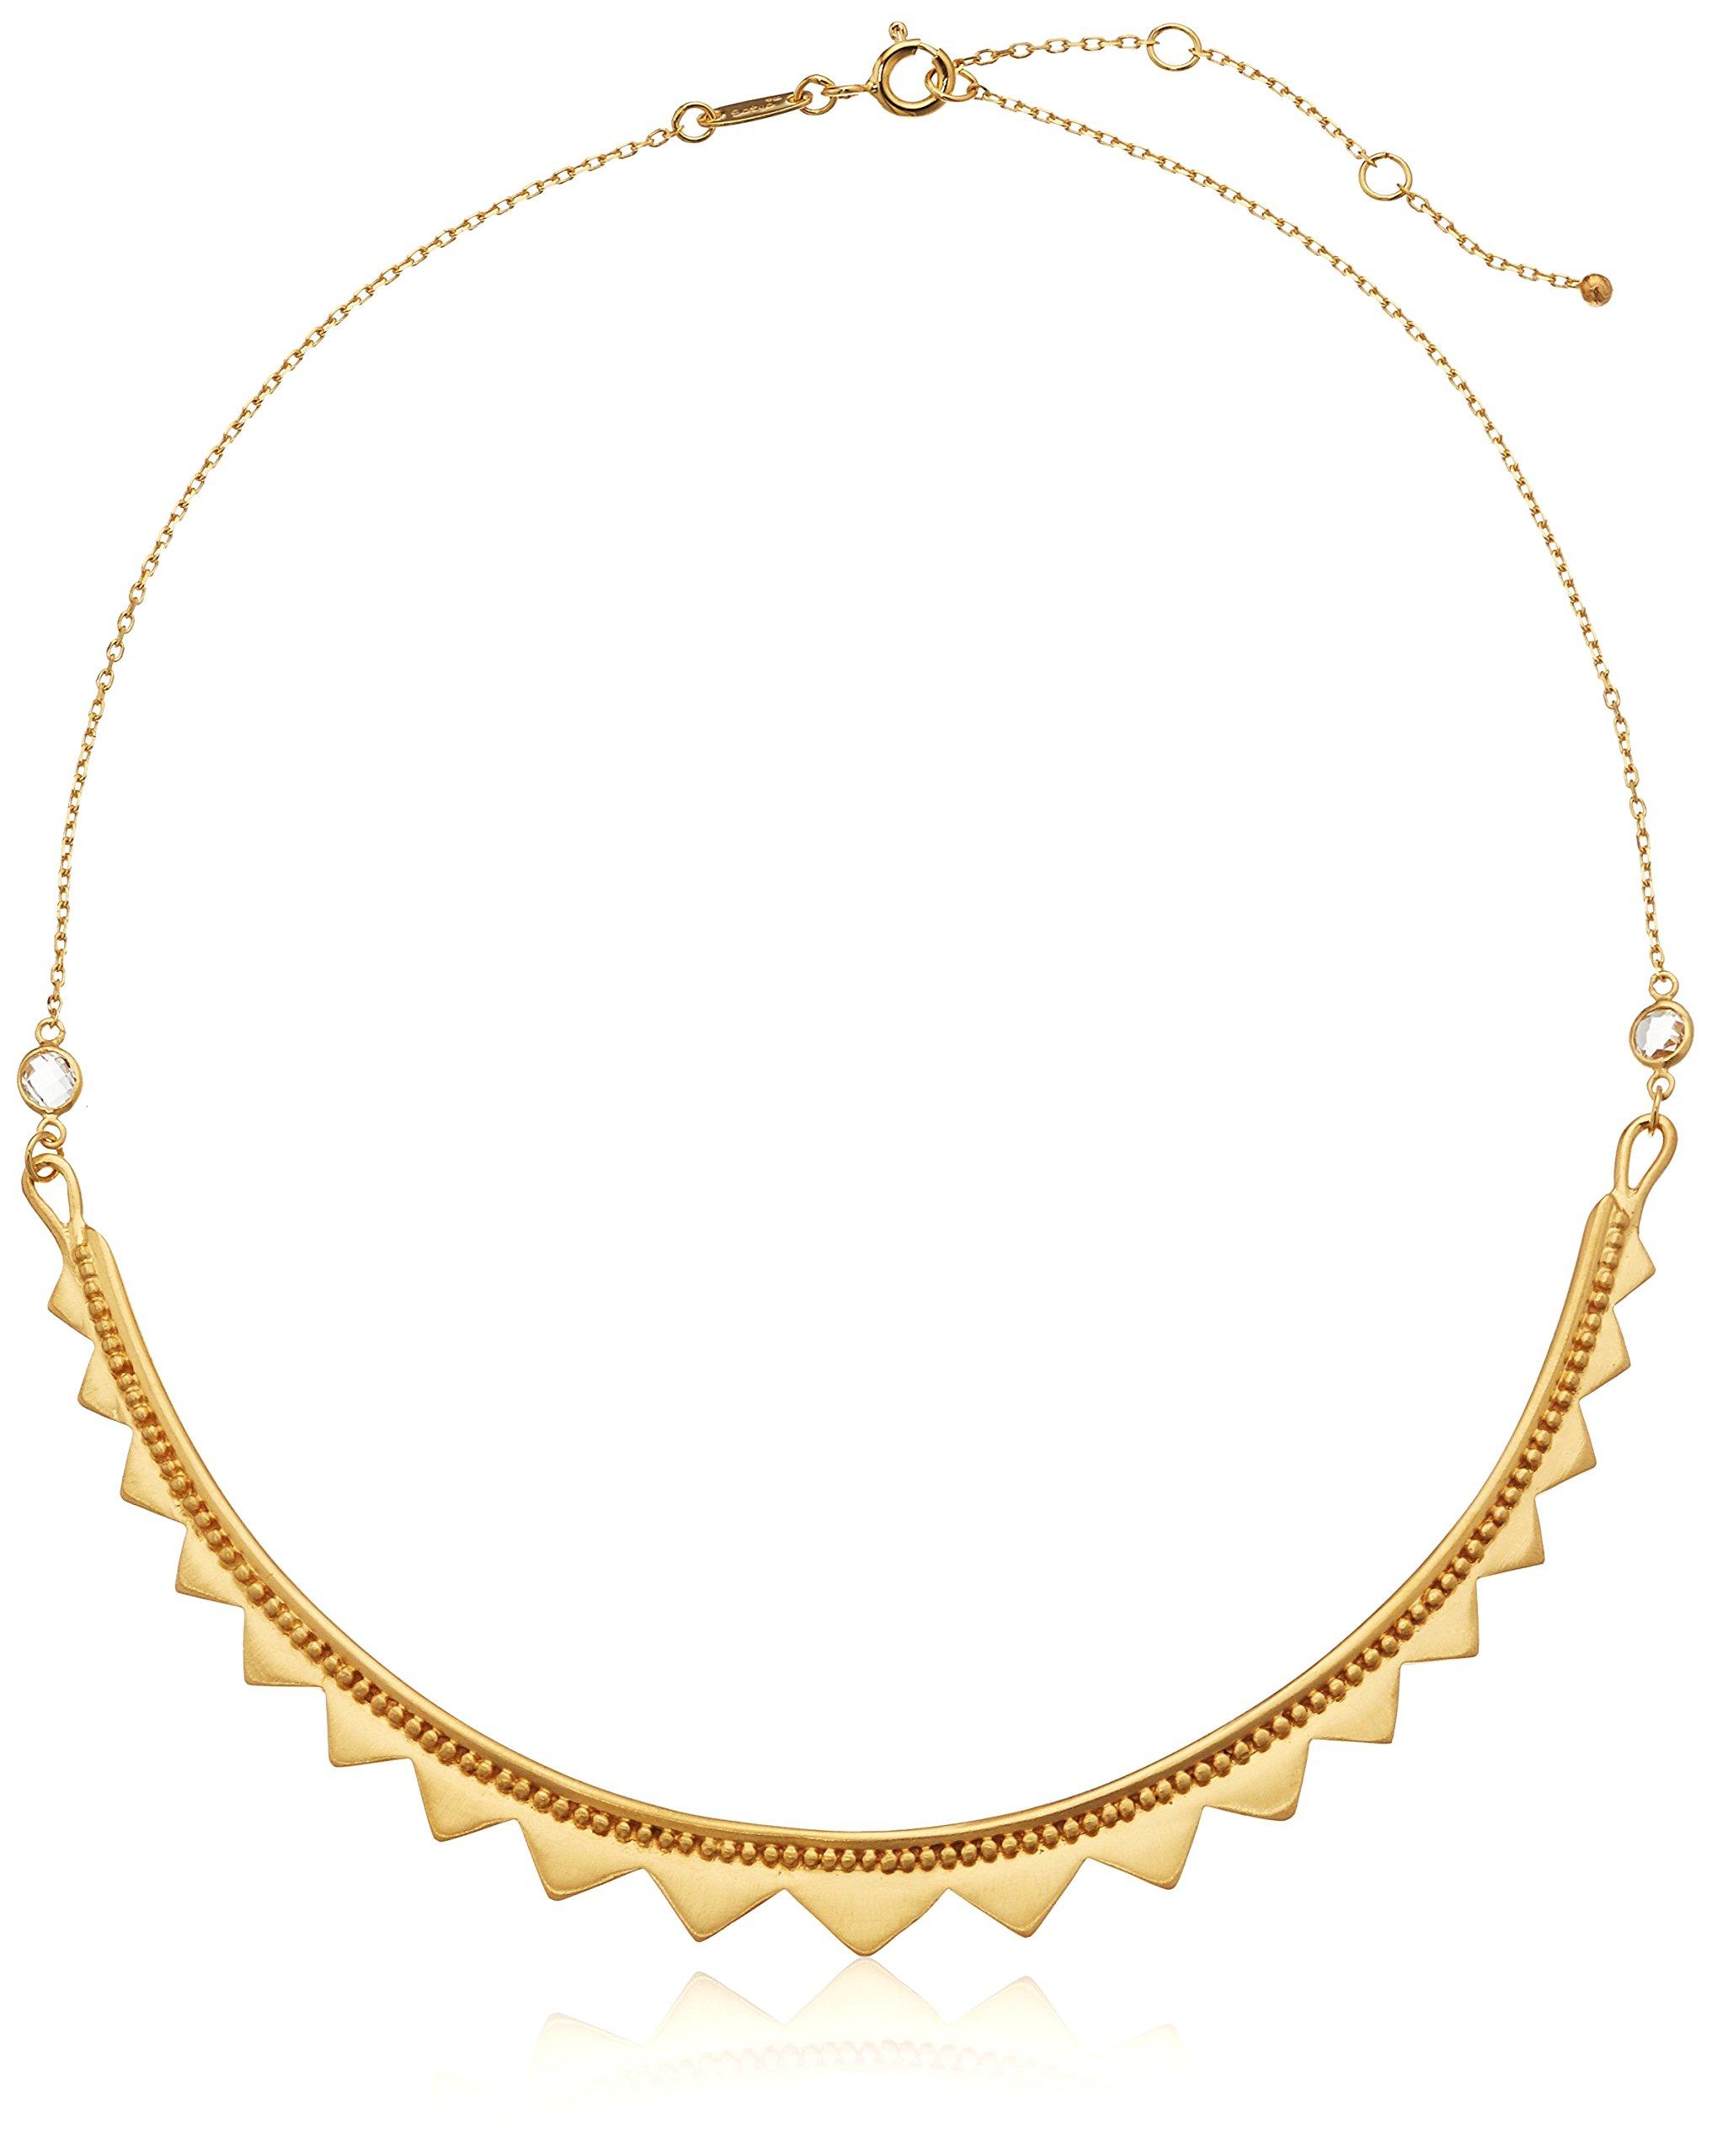 Satya Jewelry Celestial Goddess White Topaz Gold Celestial Choker Necklace, 14-Inch +2-Inch extension